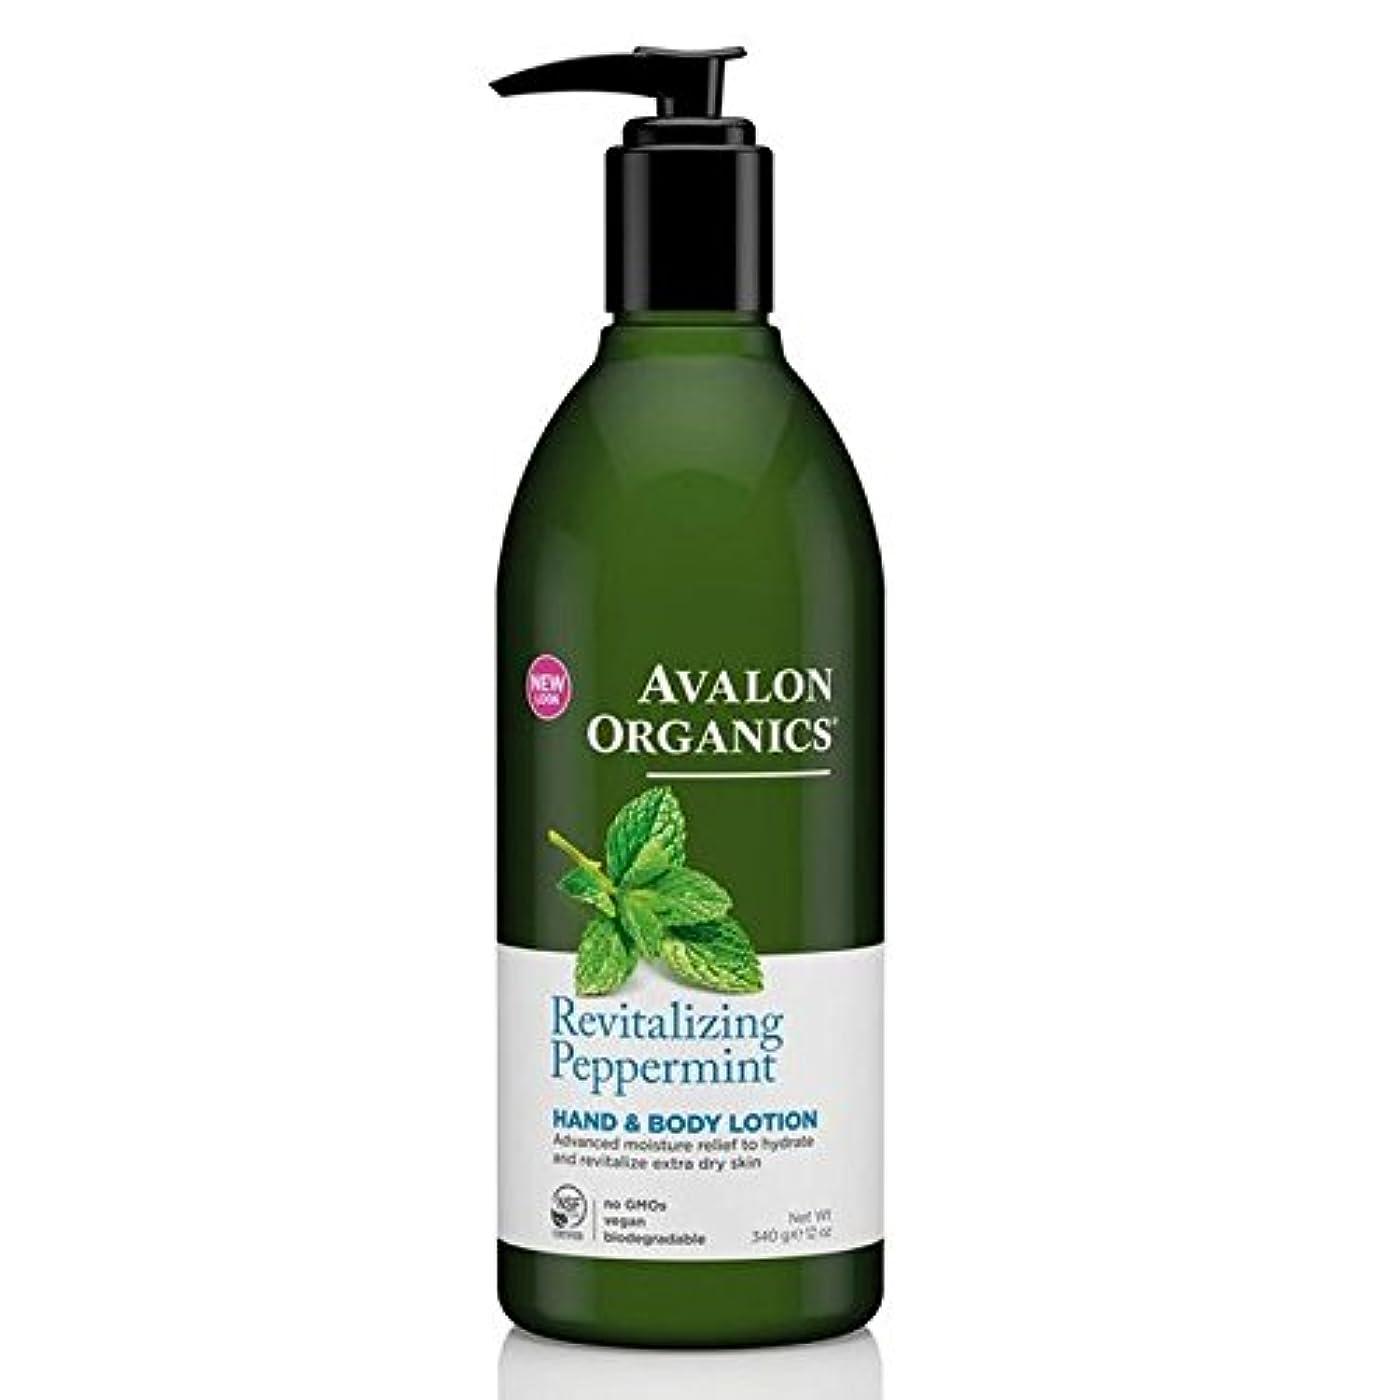 Avalon Peppermint Hand & Body Lotion 340g (Pack of 4) - (Avalon) ペパーミントハンド&ボディローション340グラム (x4) [並行輸入品]